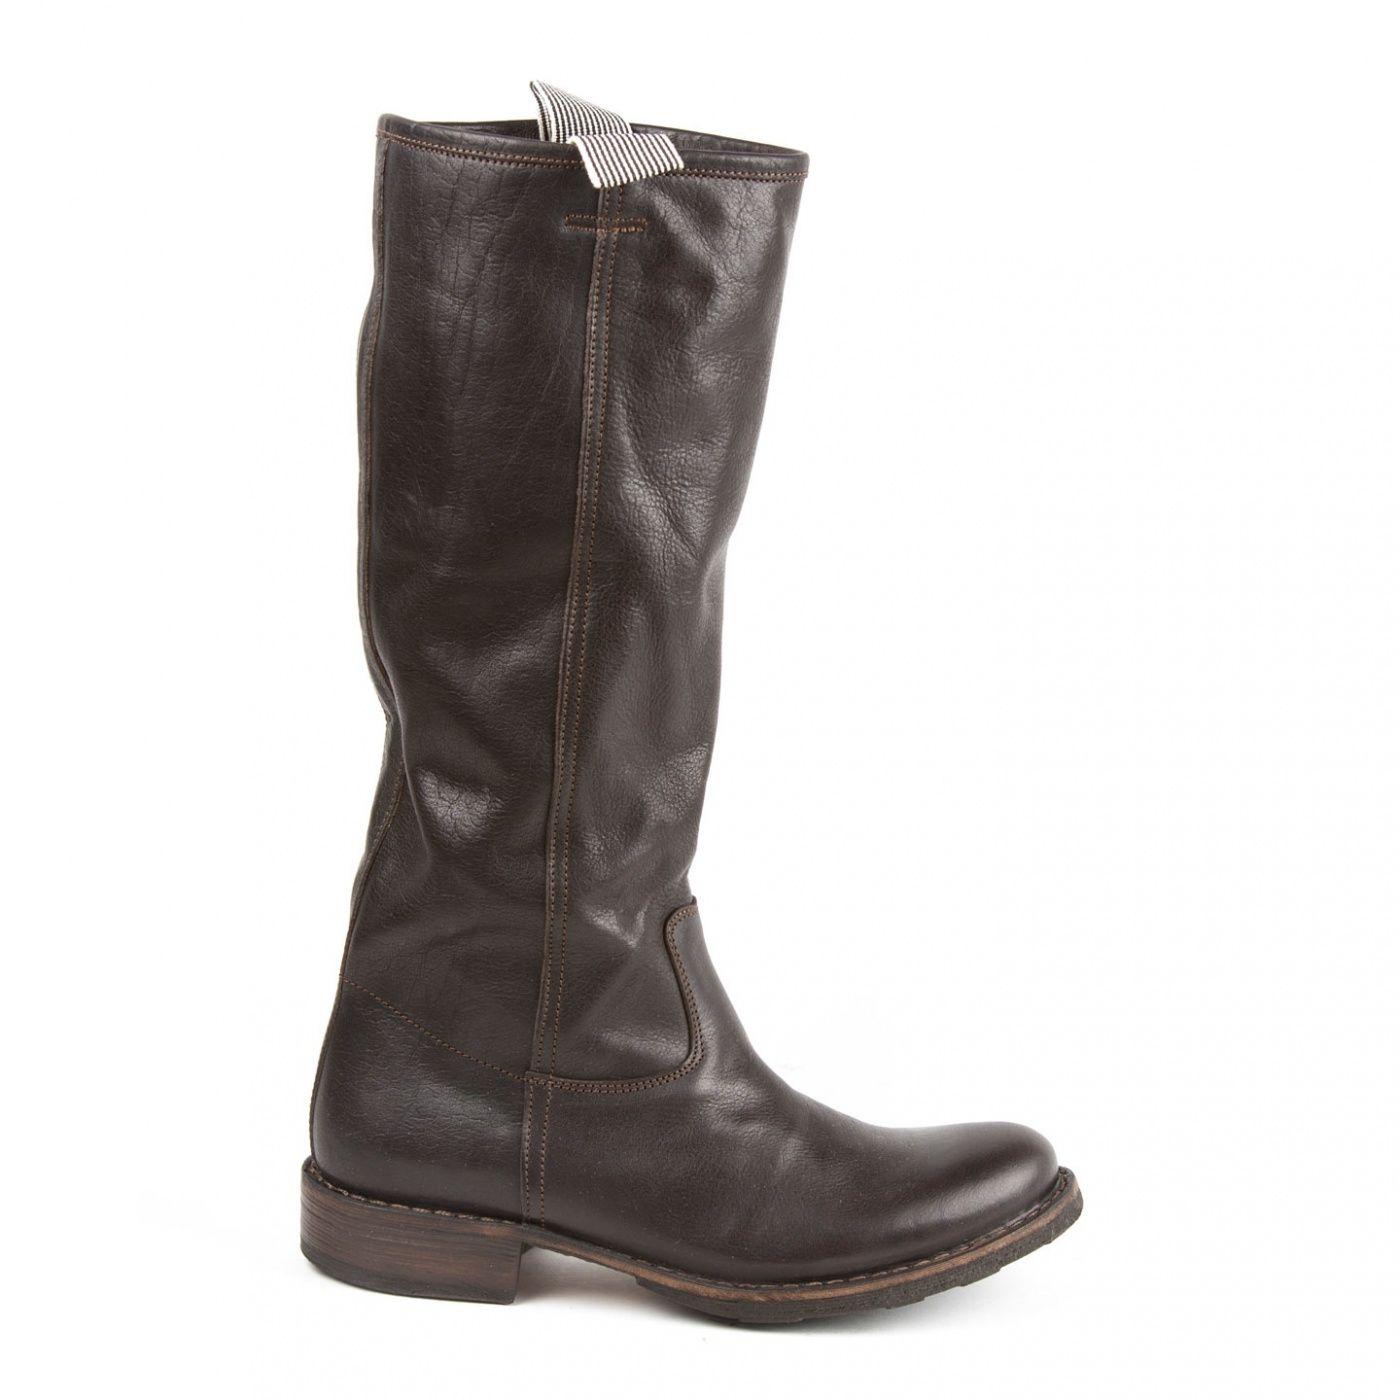 Fiorentini+Baker 7460-S Testa di Moro This is where Kate Beckinsale's boots  are